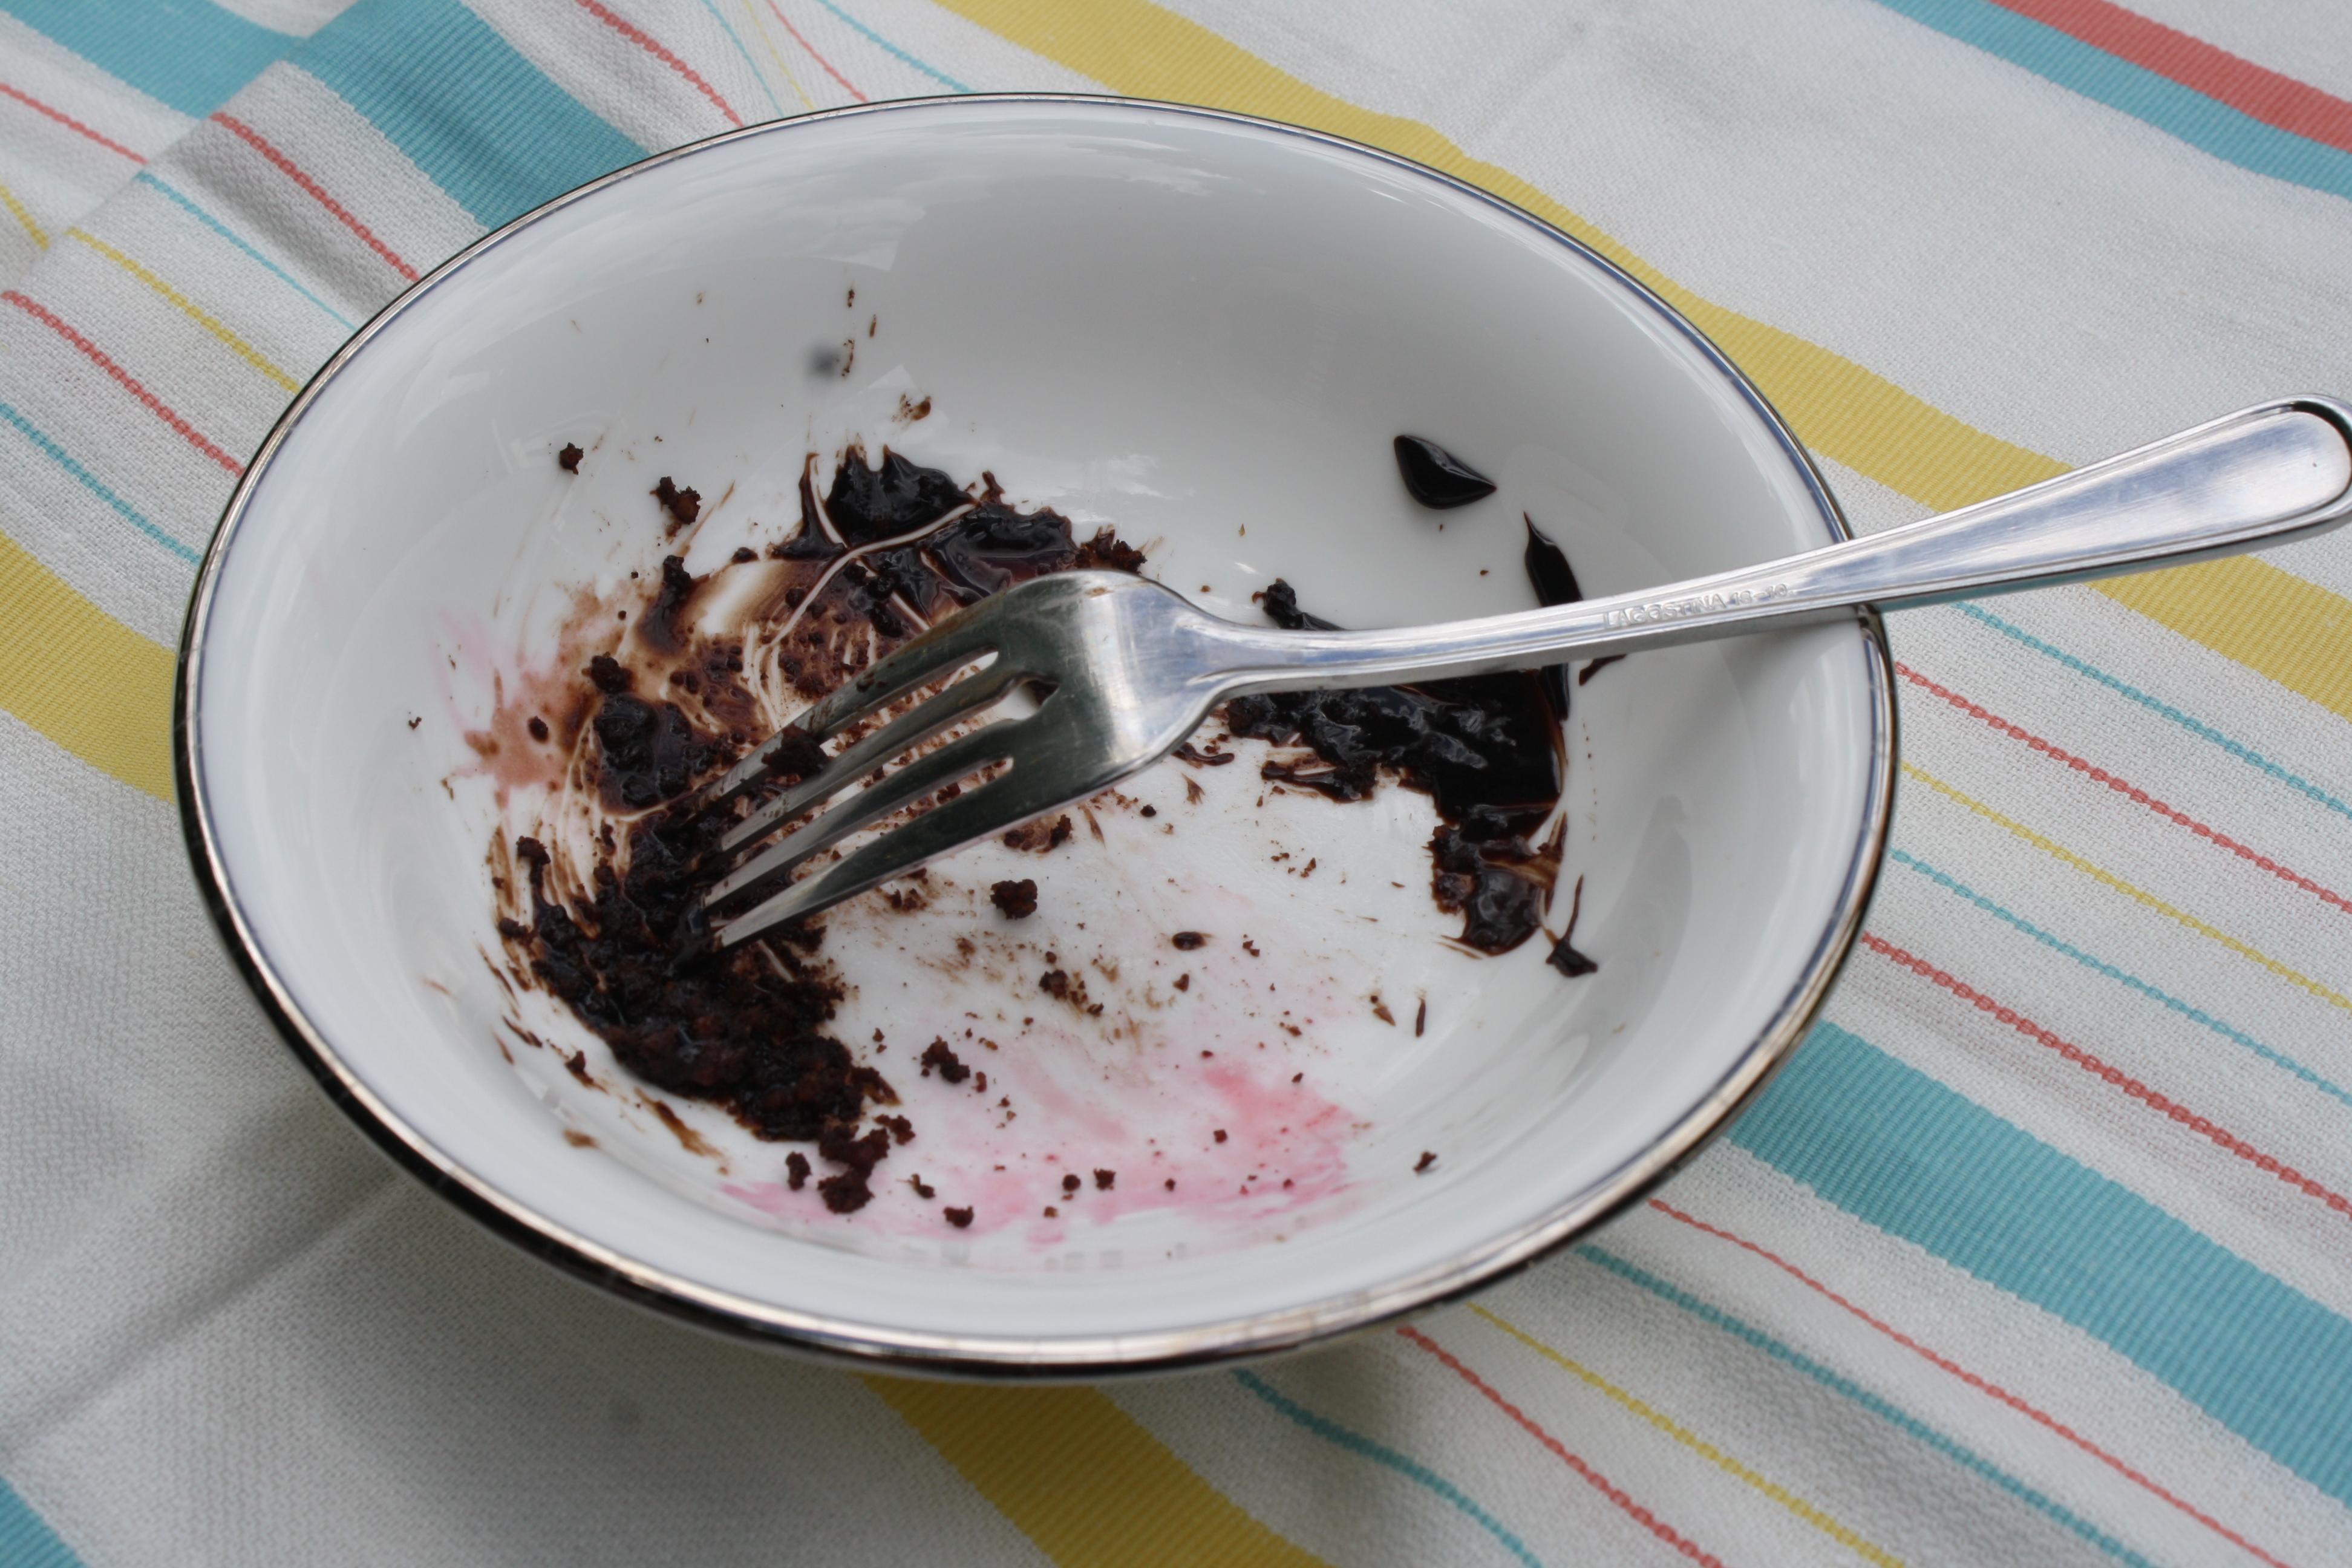 everybody enjoys this cake